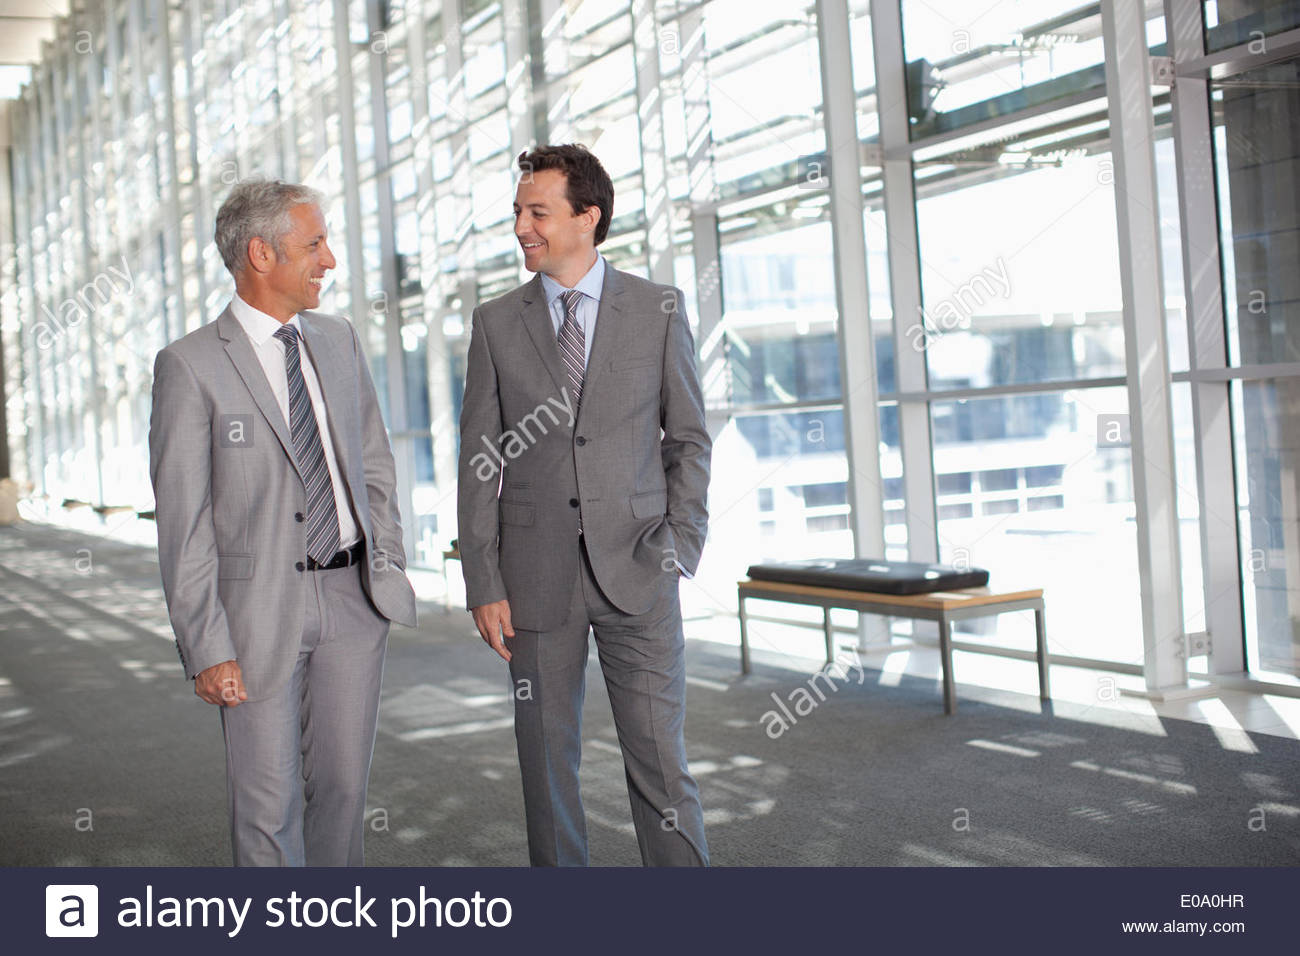 Smiling businessmen shaking hands in modern lobby - Stock Image